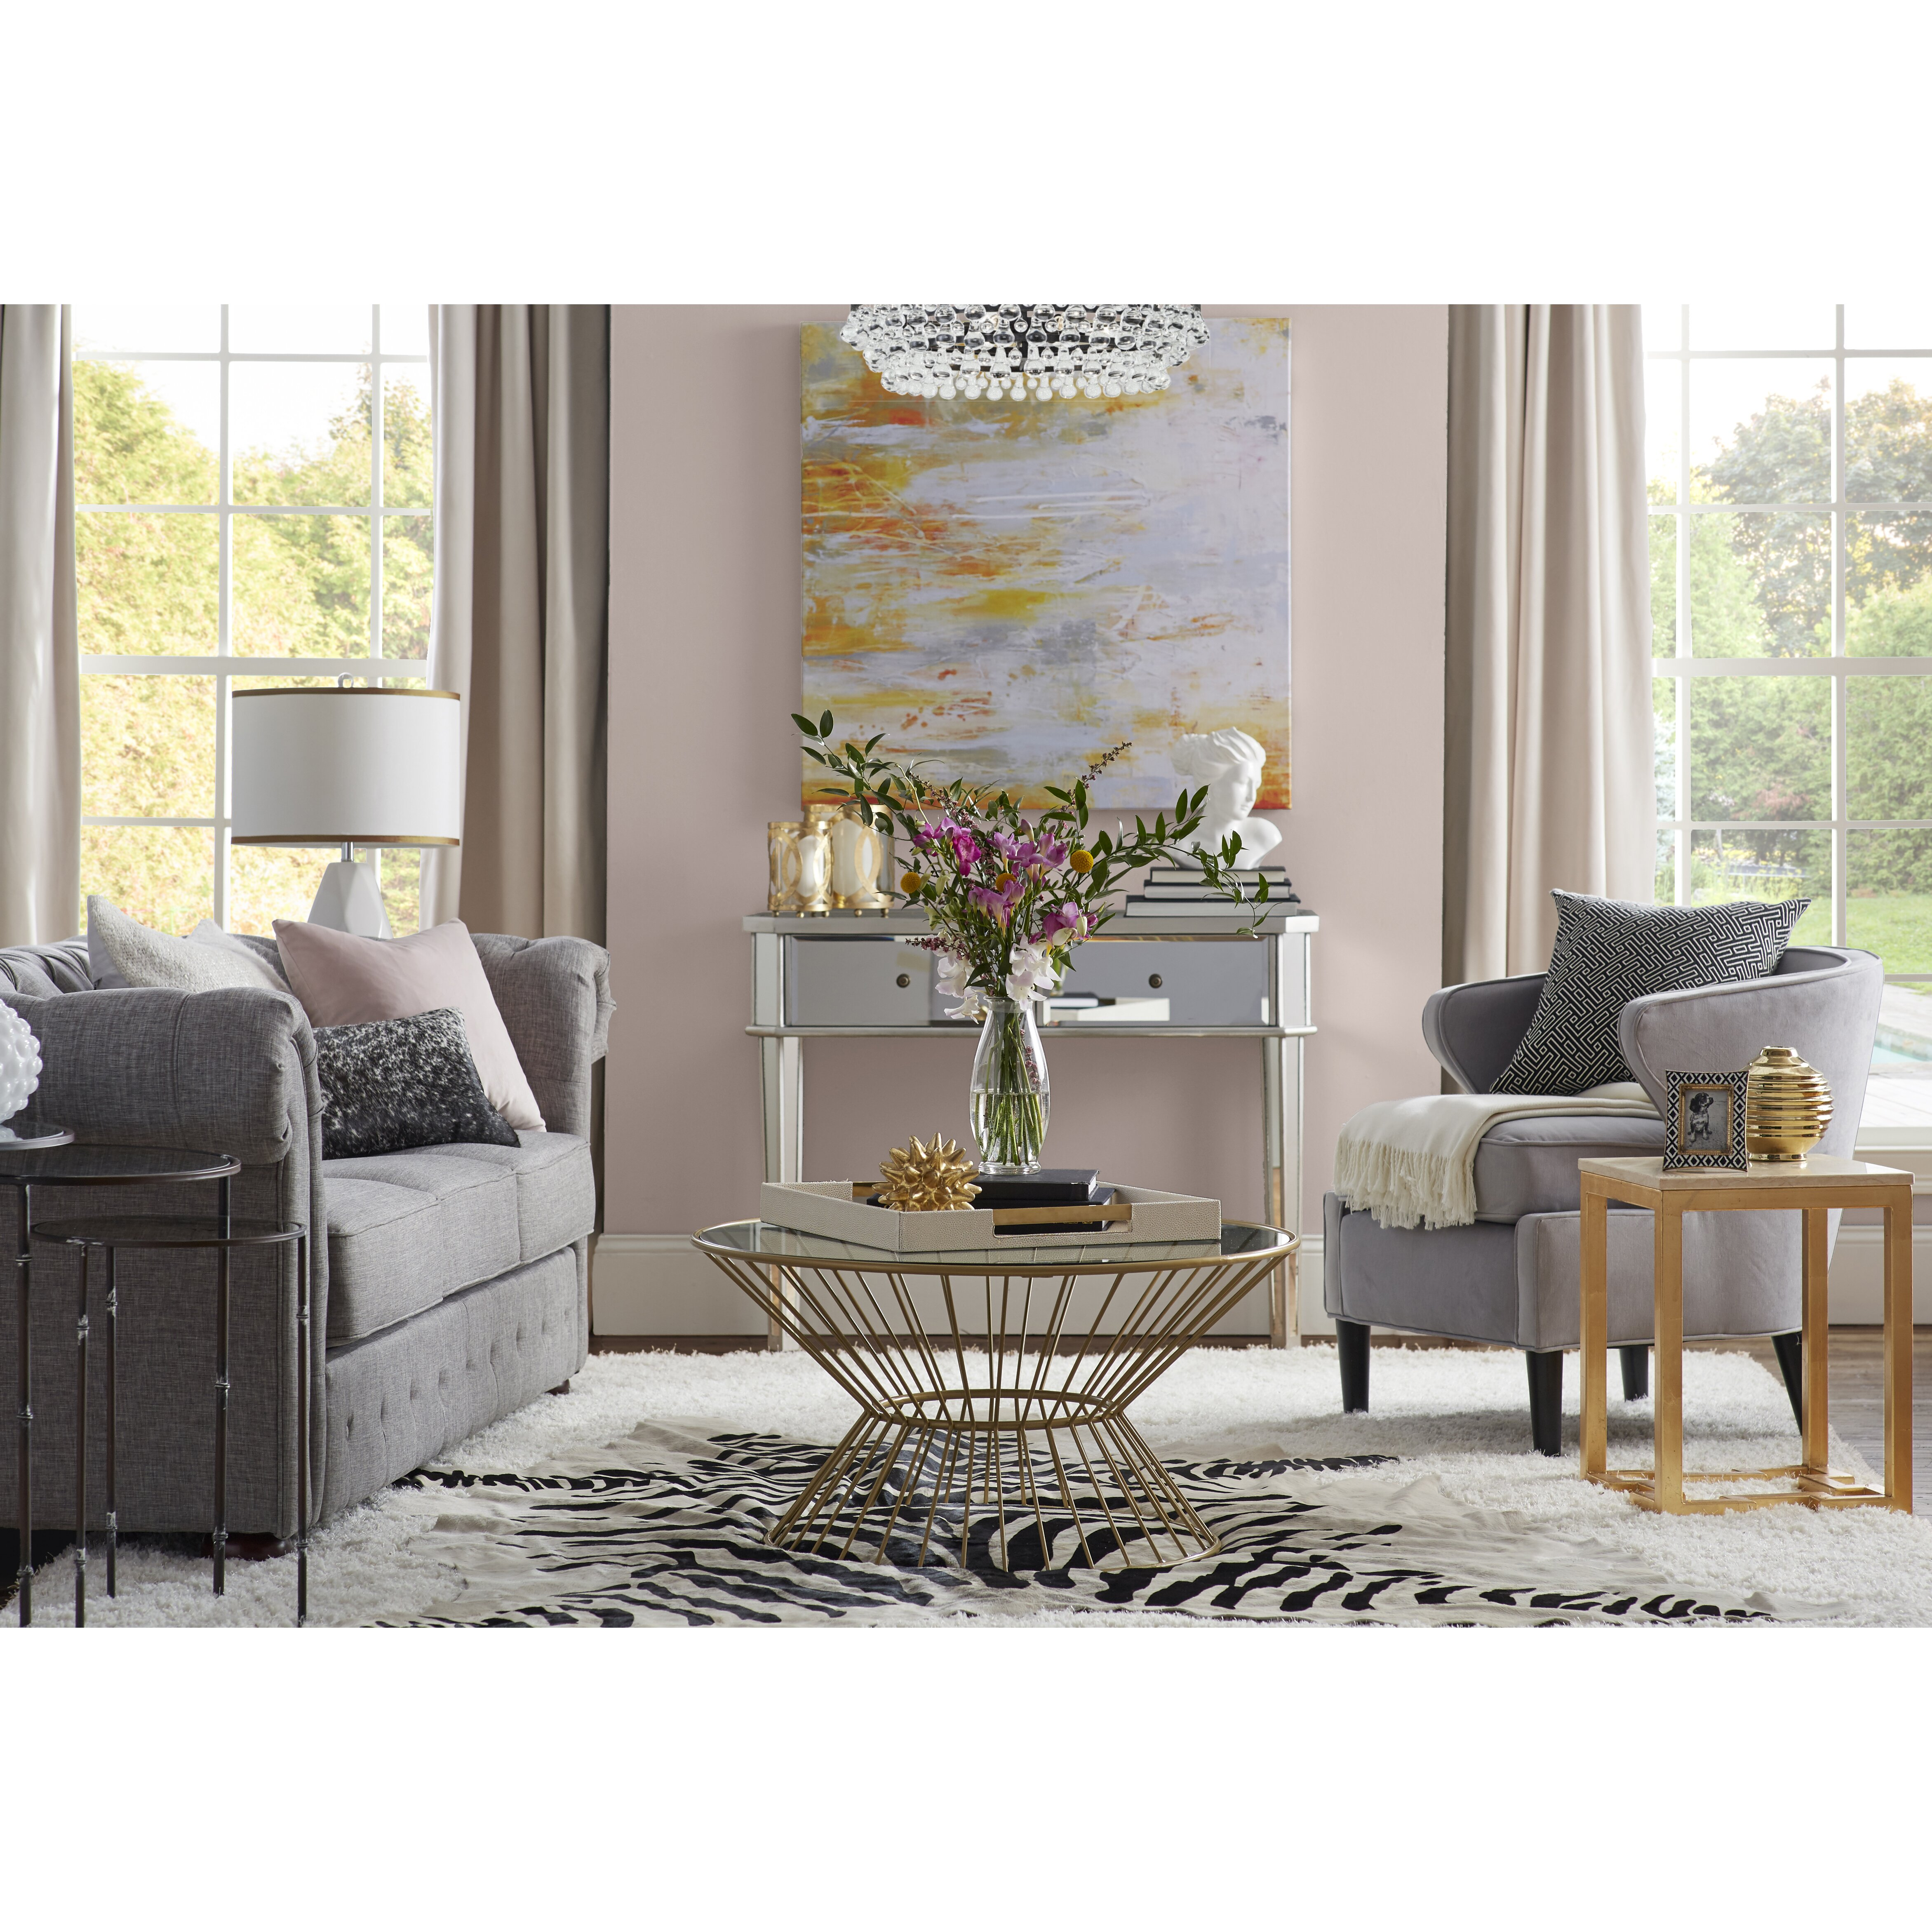 Living Room With Chesterfield Sofa Kellan 91 Chesterfield Sofa Reviews Joss Main